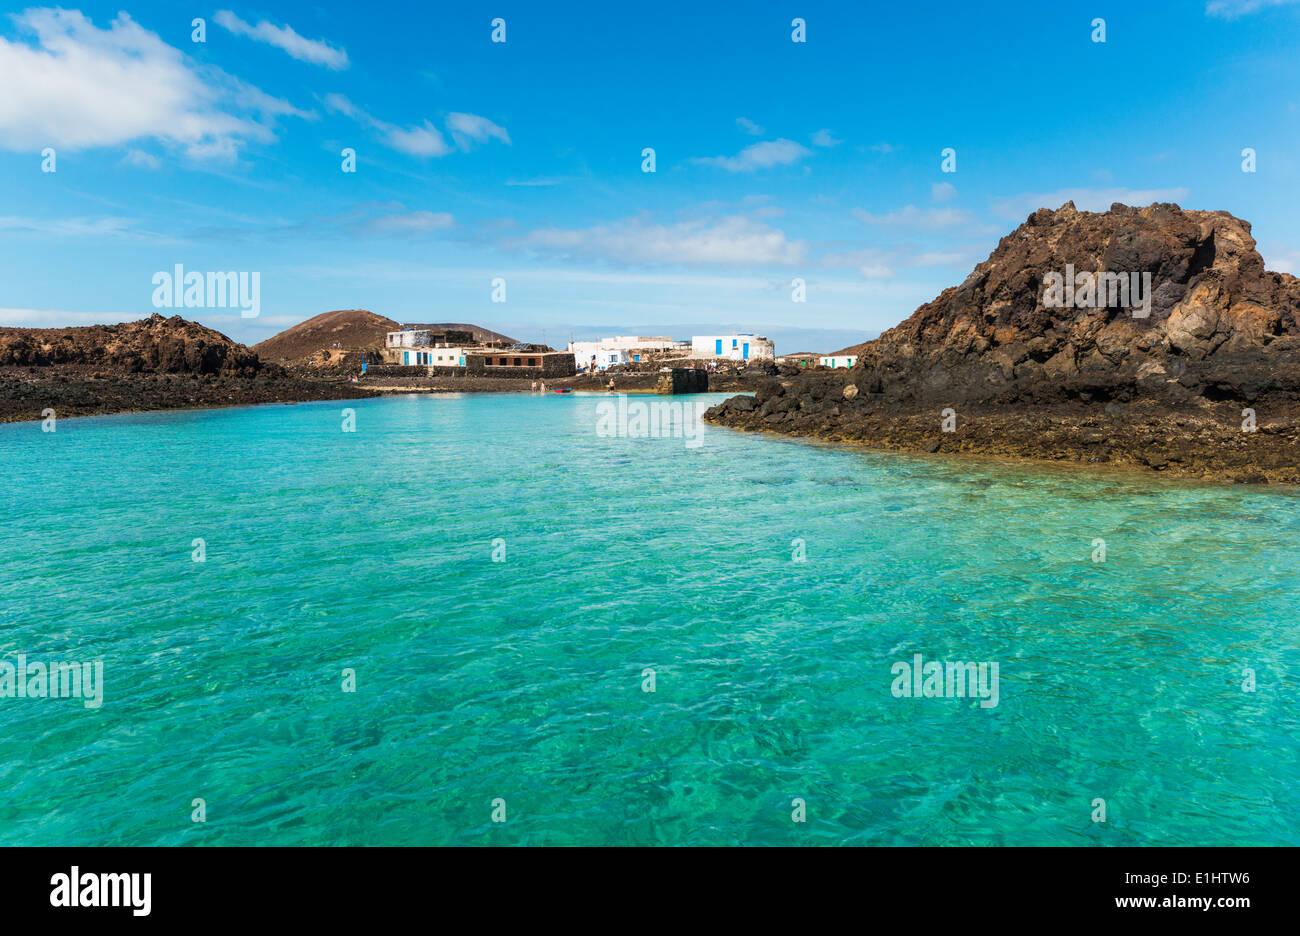 El Puertito, La Isla de Lobos, Fuerteventura, Kanarische Inseln, Spanien. Stockbild